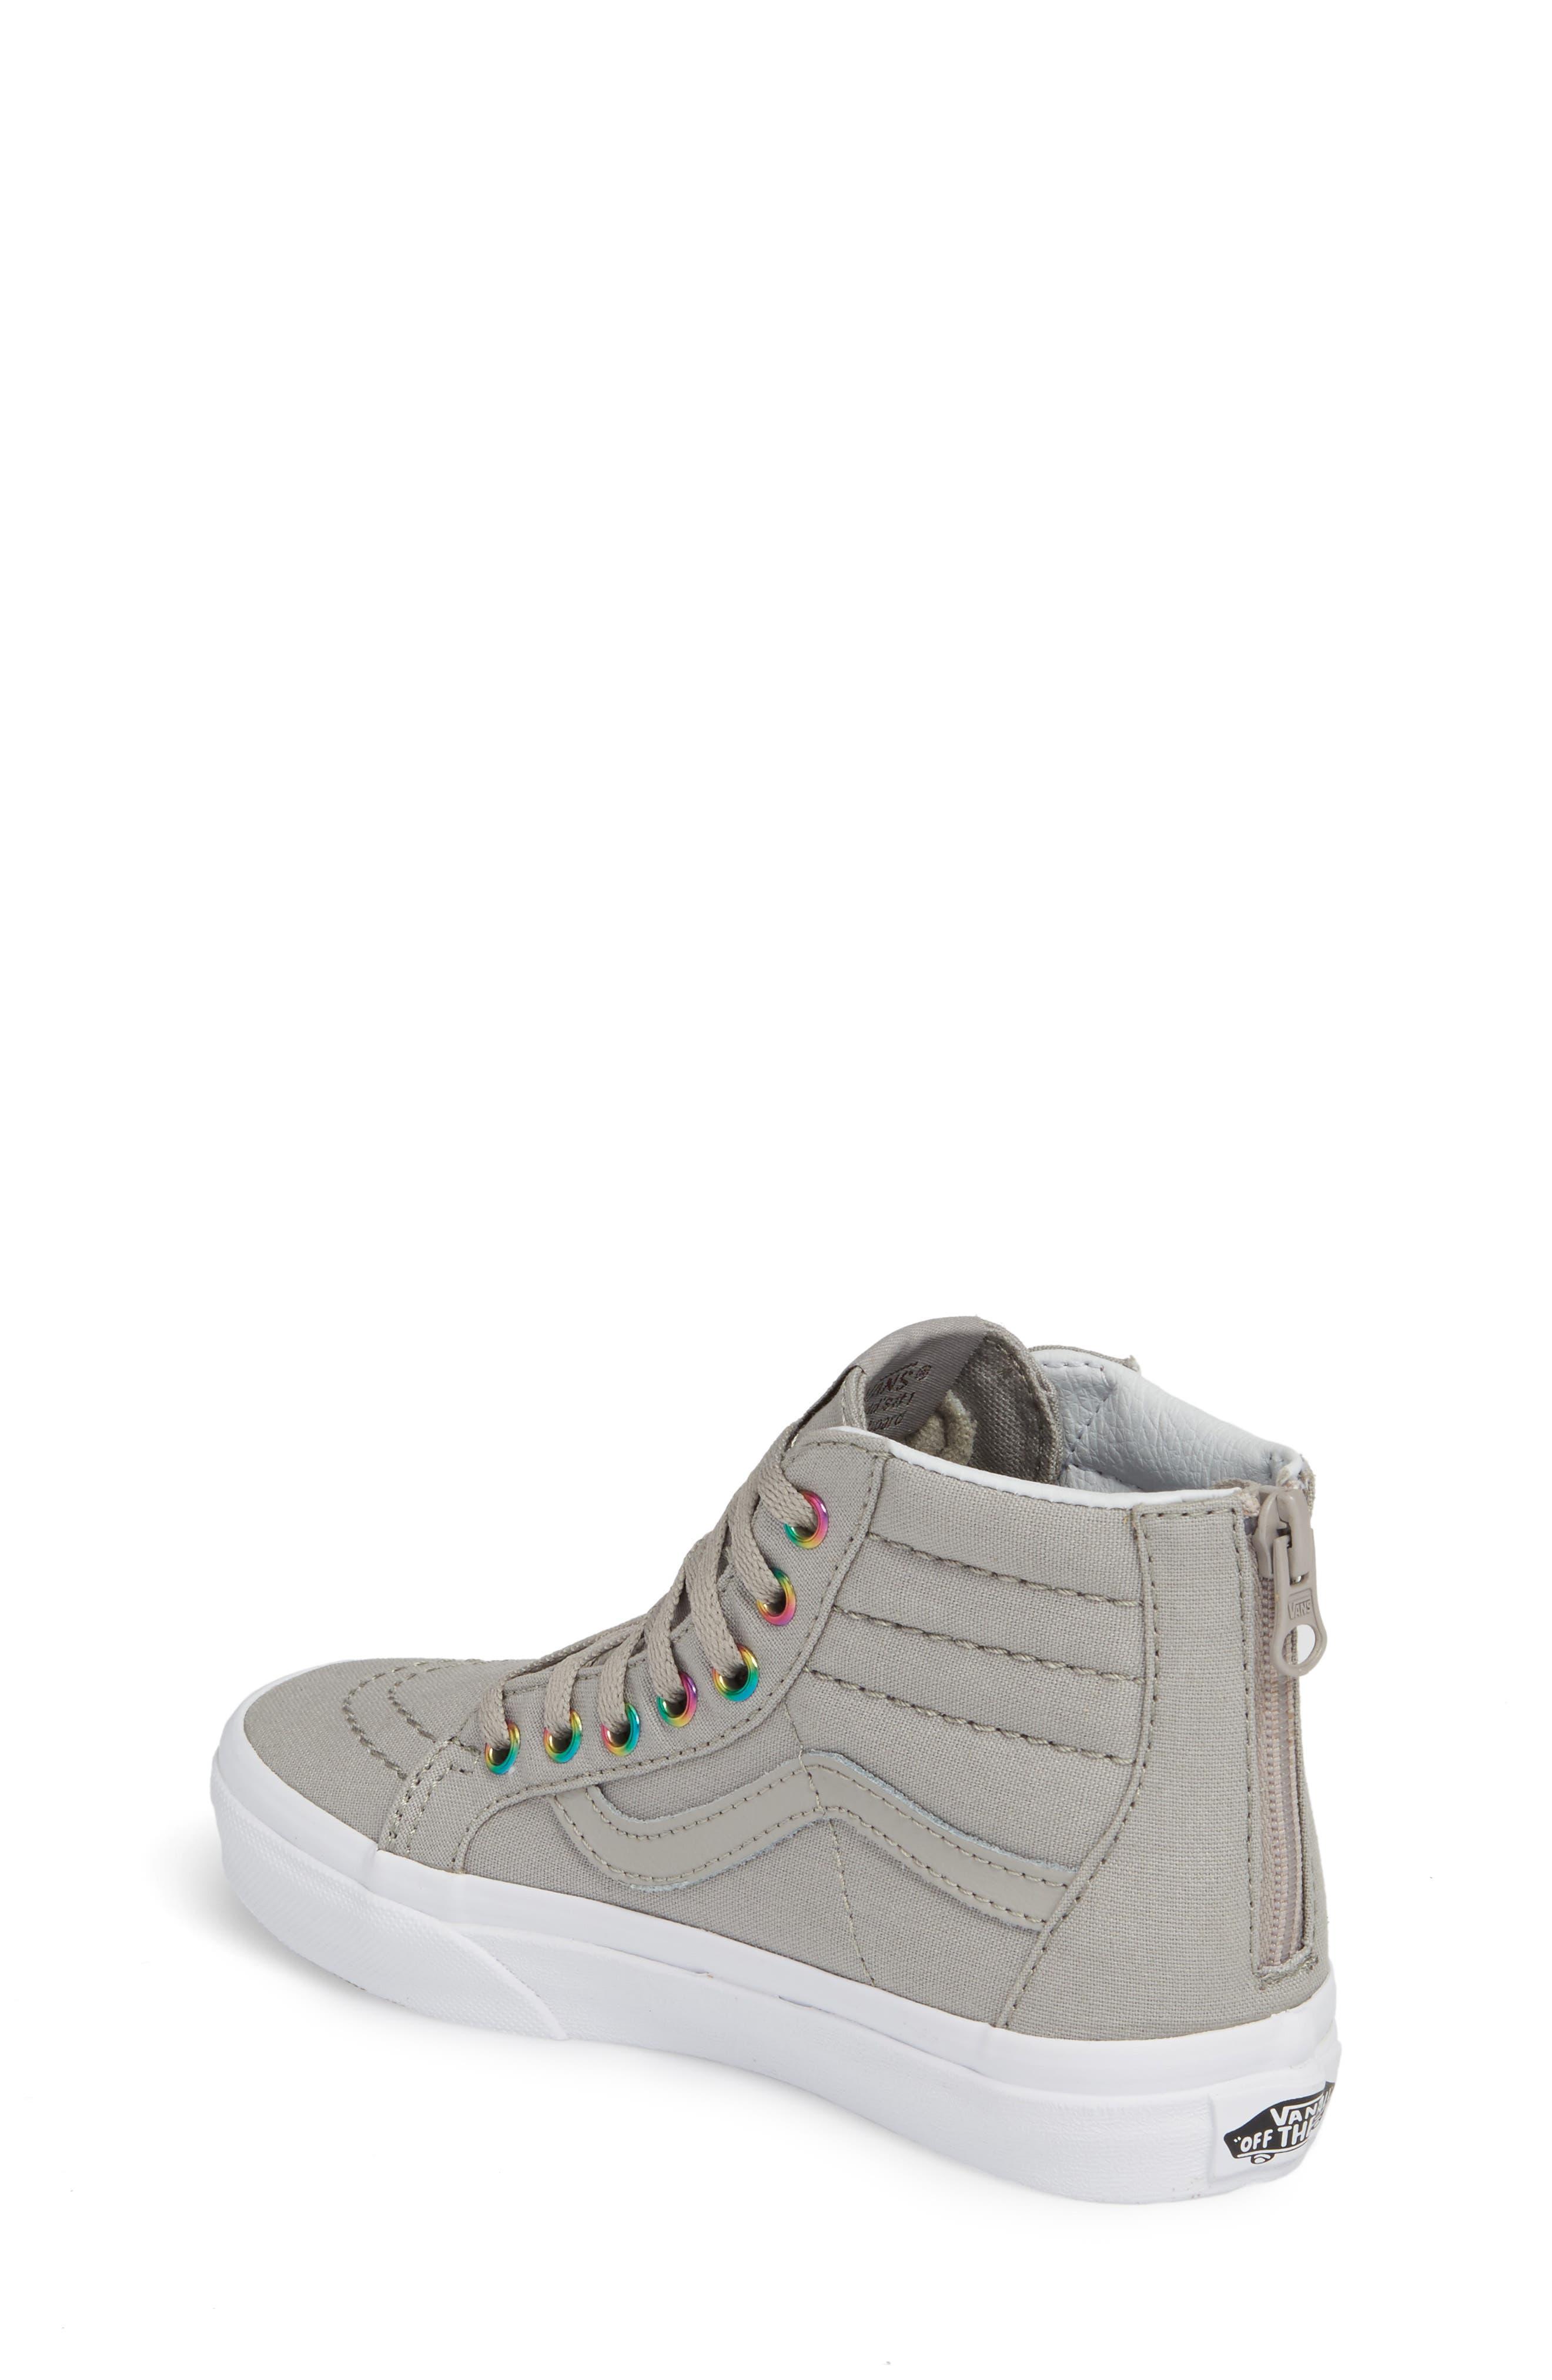 Sk8-Hi Zip High Top Sneaker,                             Alternate thumbnail 2, color,                             Rainbow Eyelet Drizzle